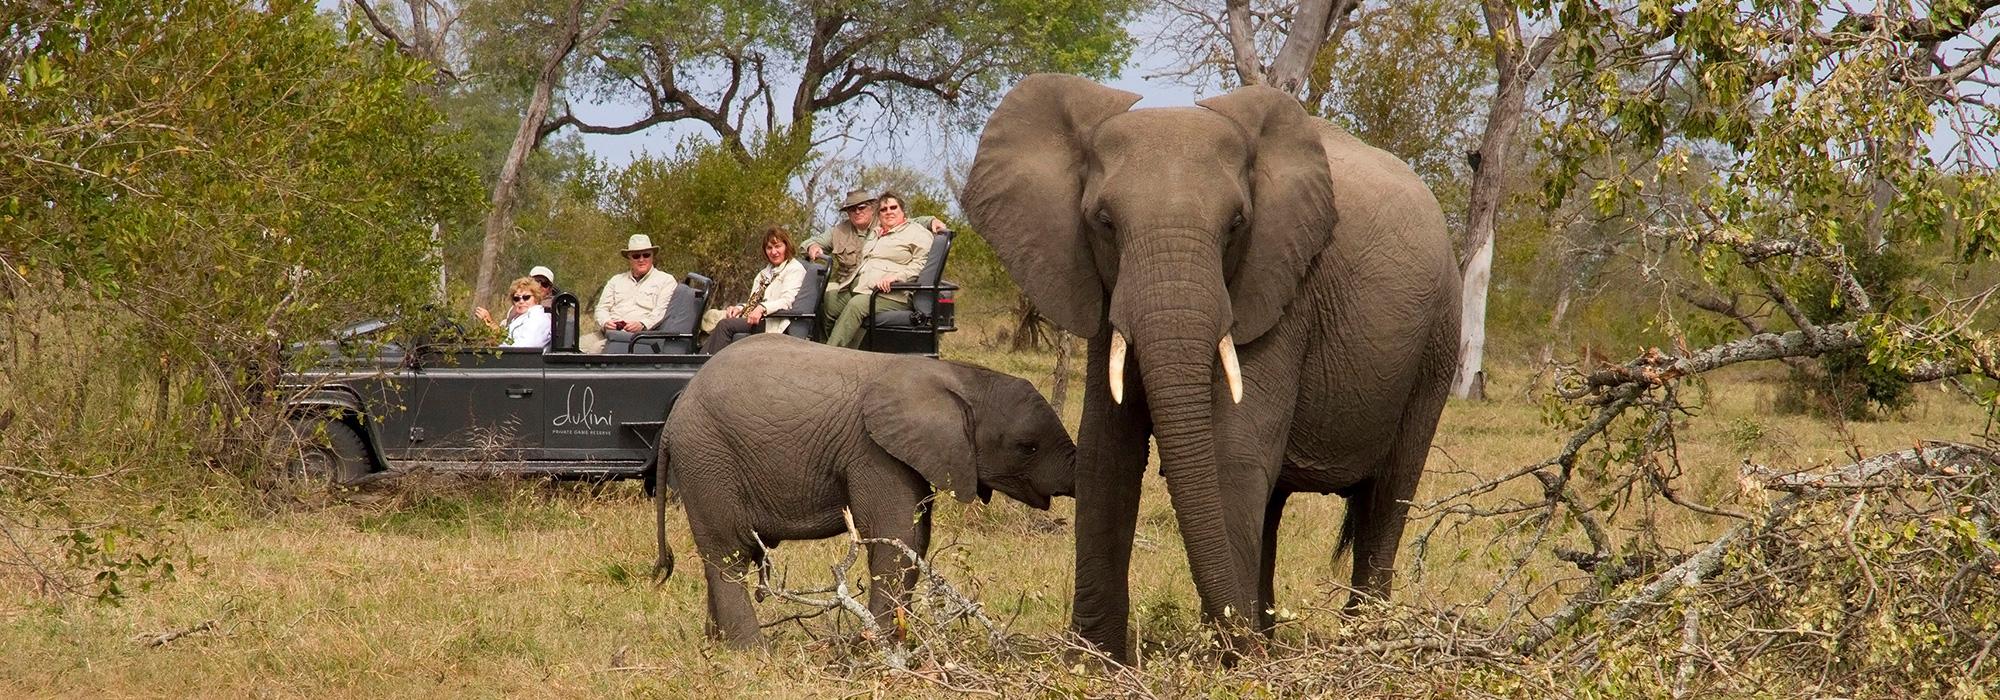 Elephants on Safari in South Africa